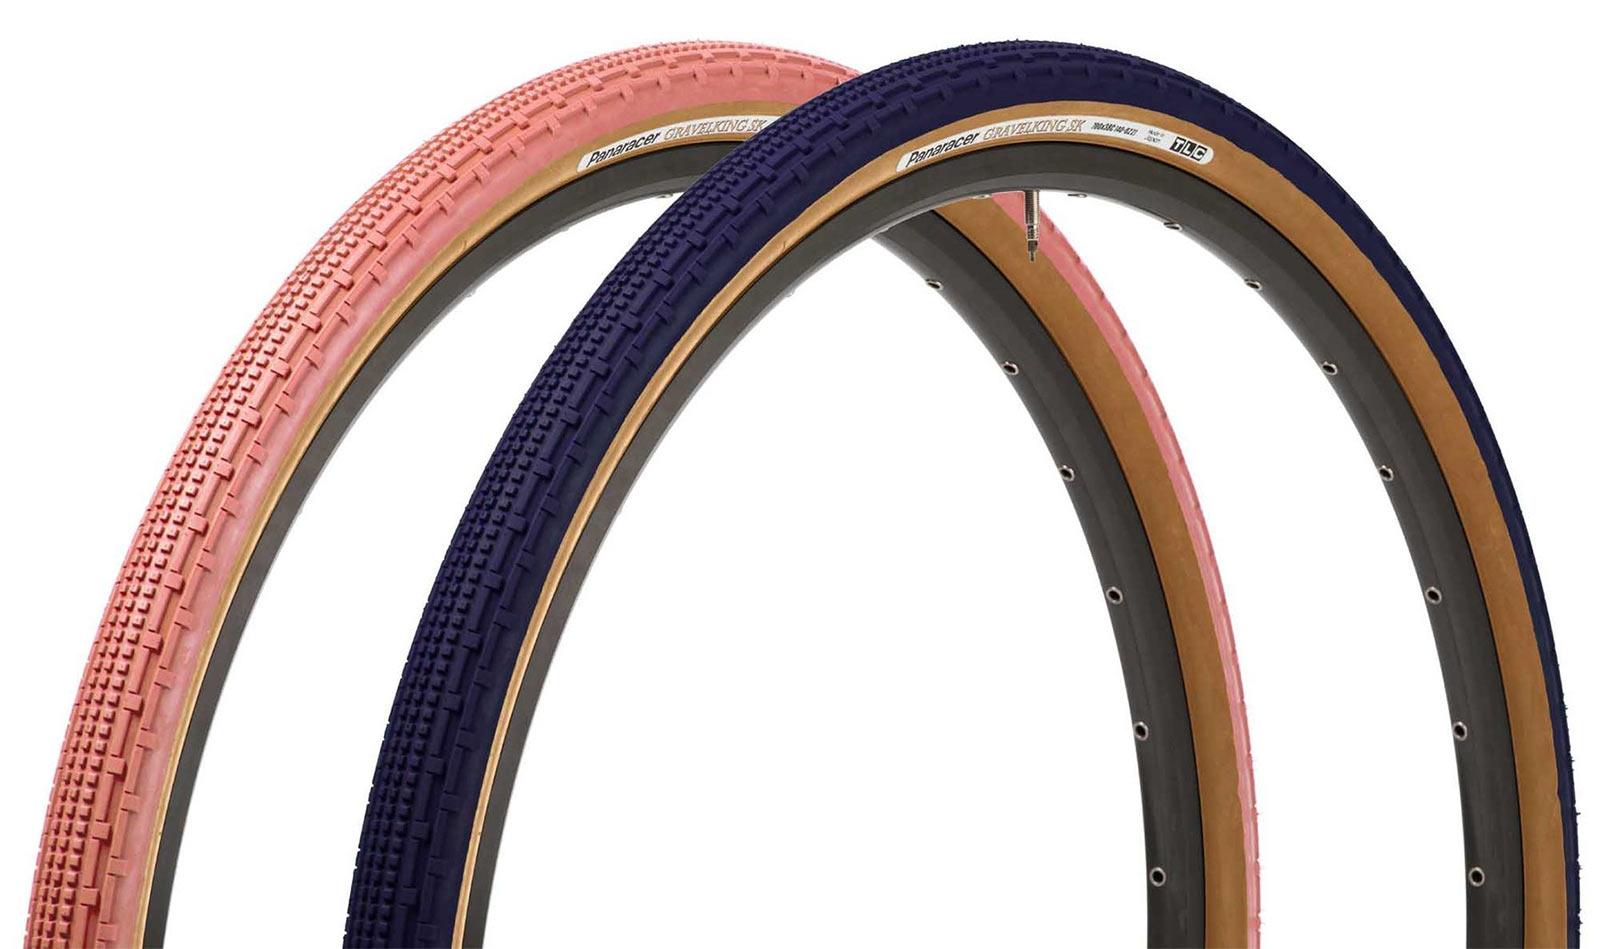 2021 limited edition pink and blue colors for panaracer gravelking SK semi knob gravel bike tires